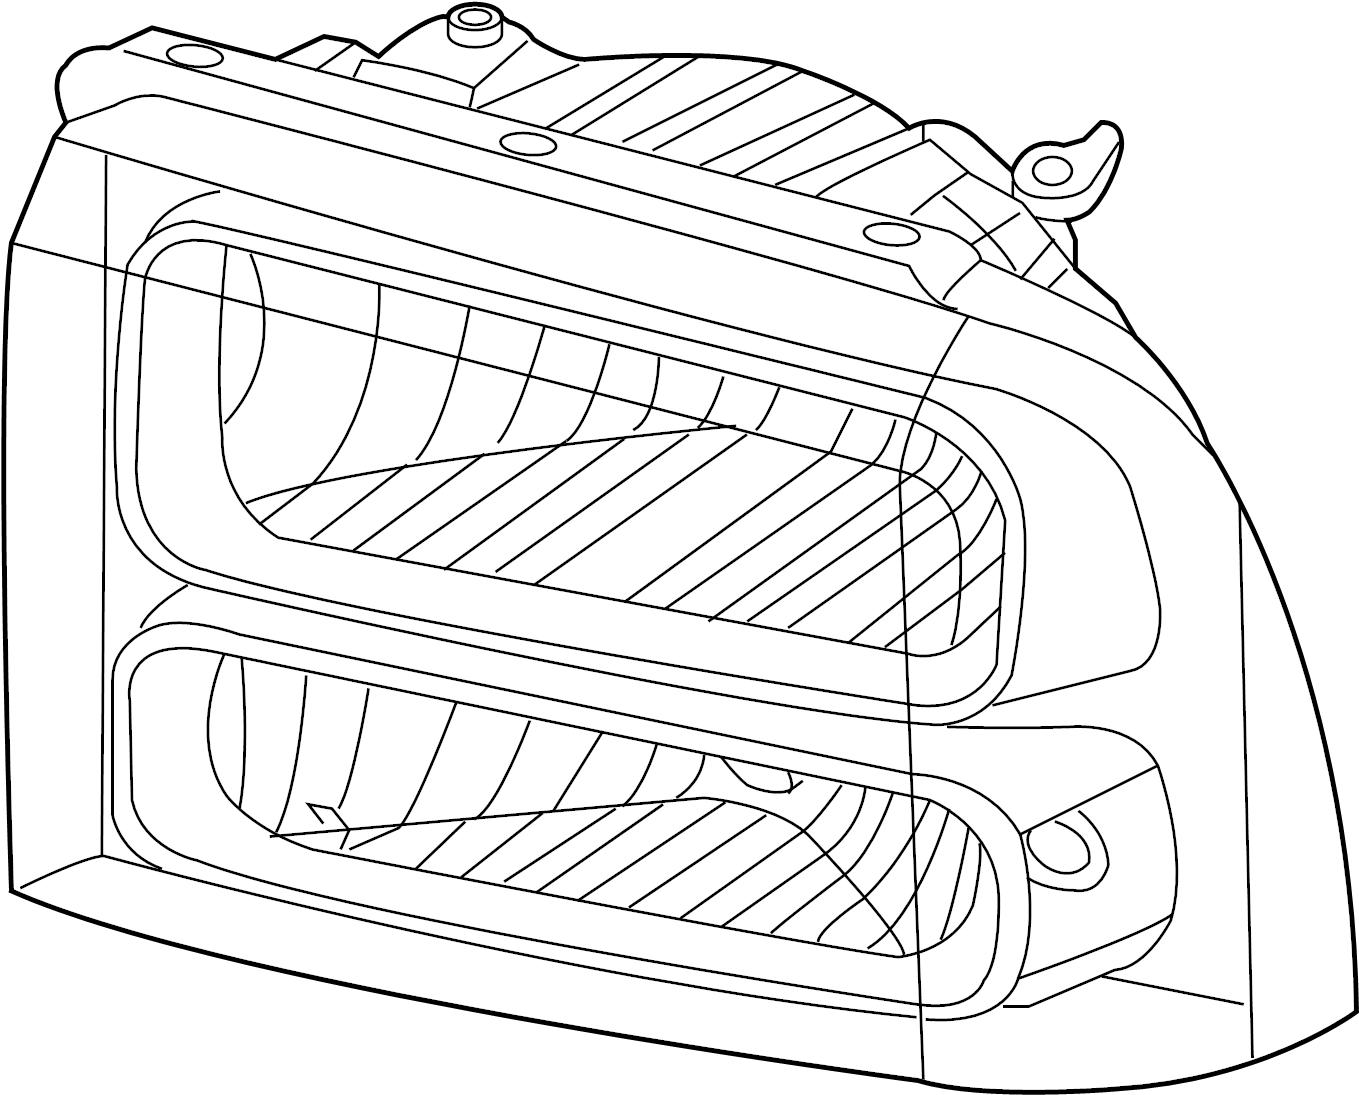 Ford F 250 Super Duty Headlight